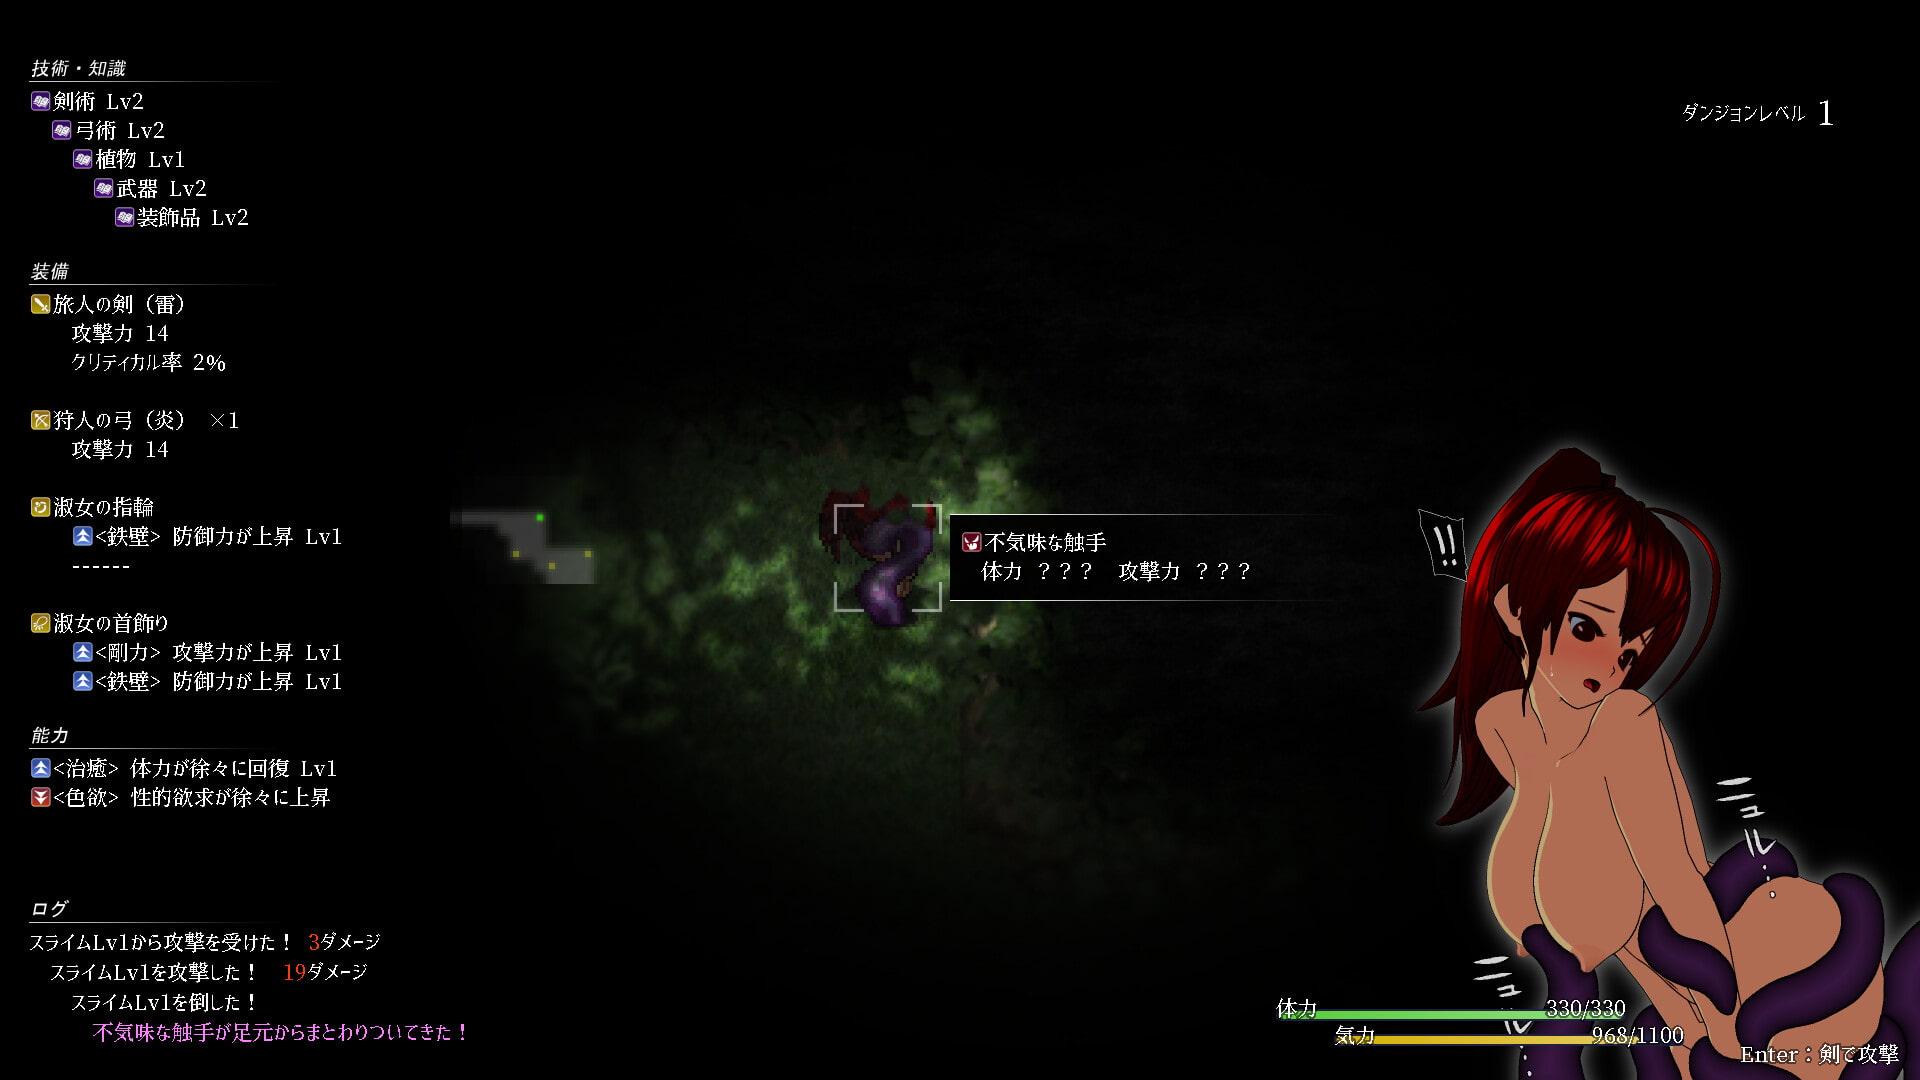 RJ344798 姫騎士エレーナ ~奪われた婚約者~ [20210925]